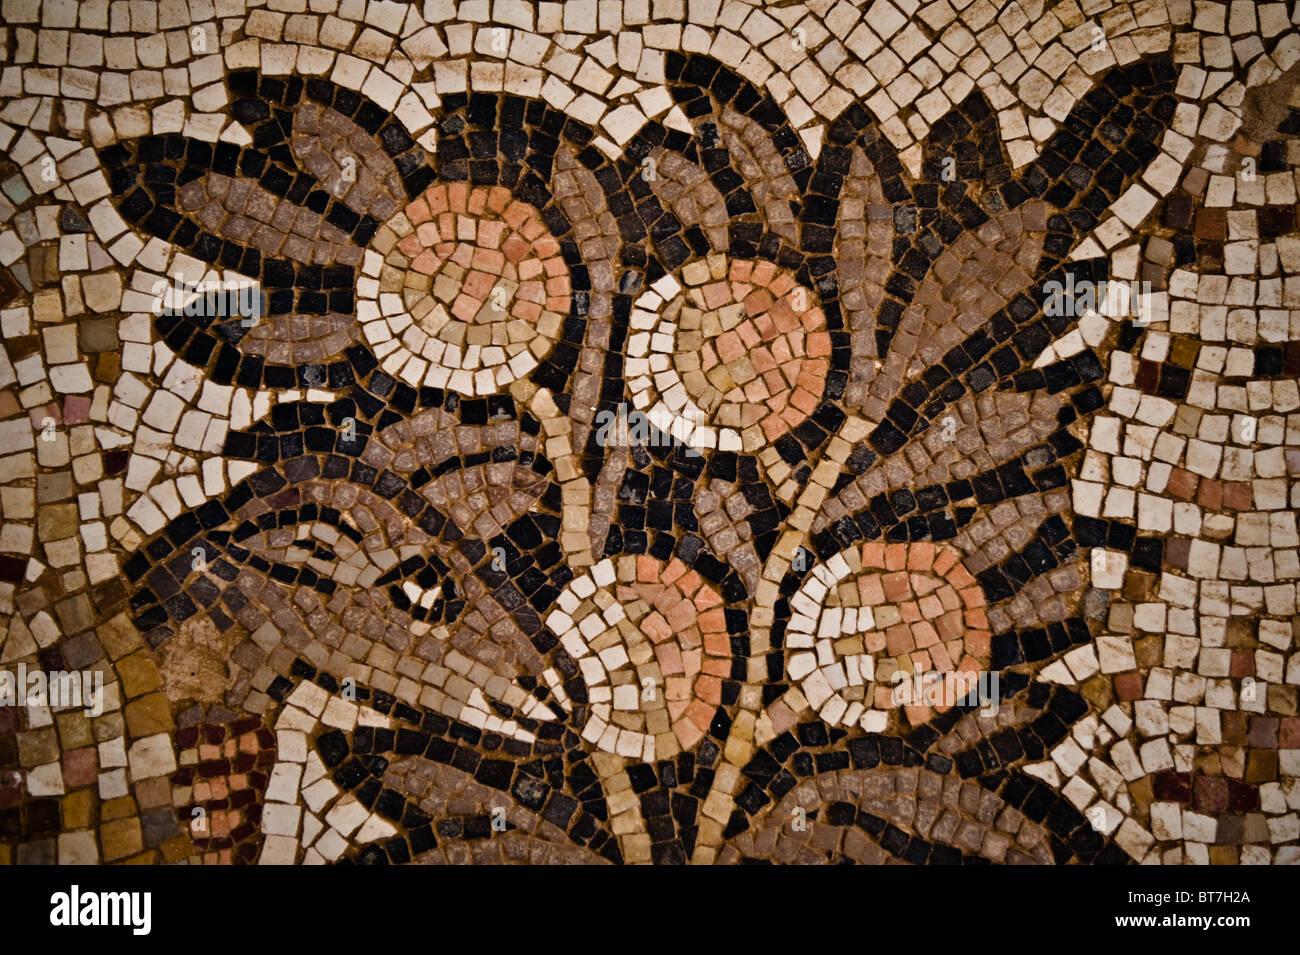 Detail from mosaic floor of the 8th Century Church of St. Stephen at Umm al-Rasas, Jordan. - Stock Image